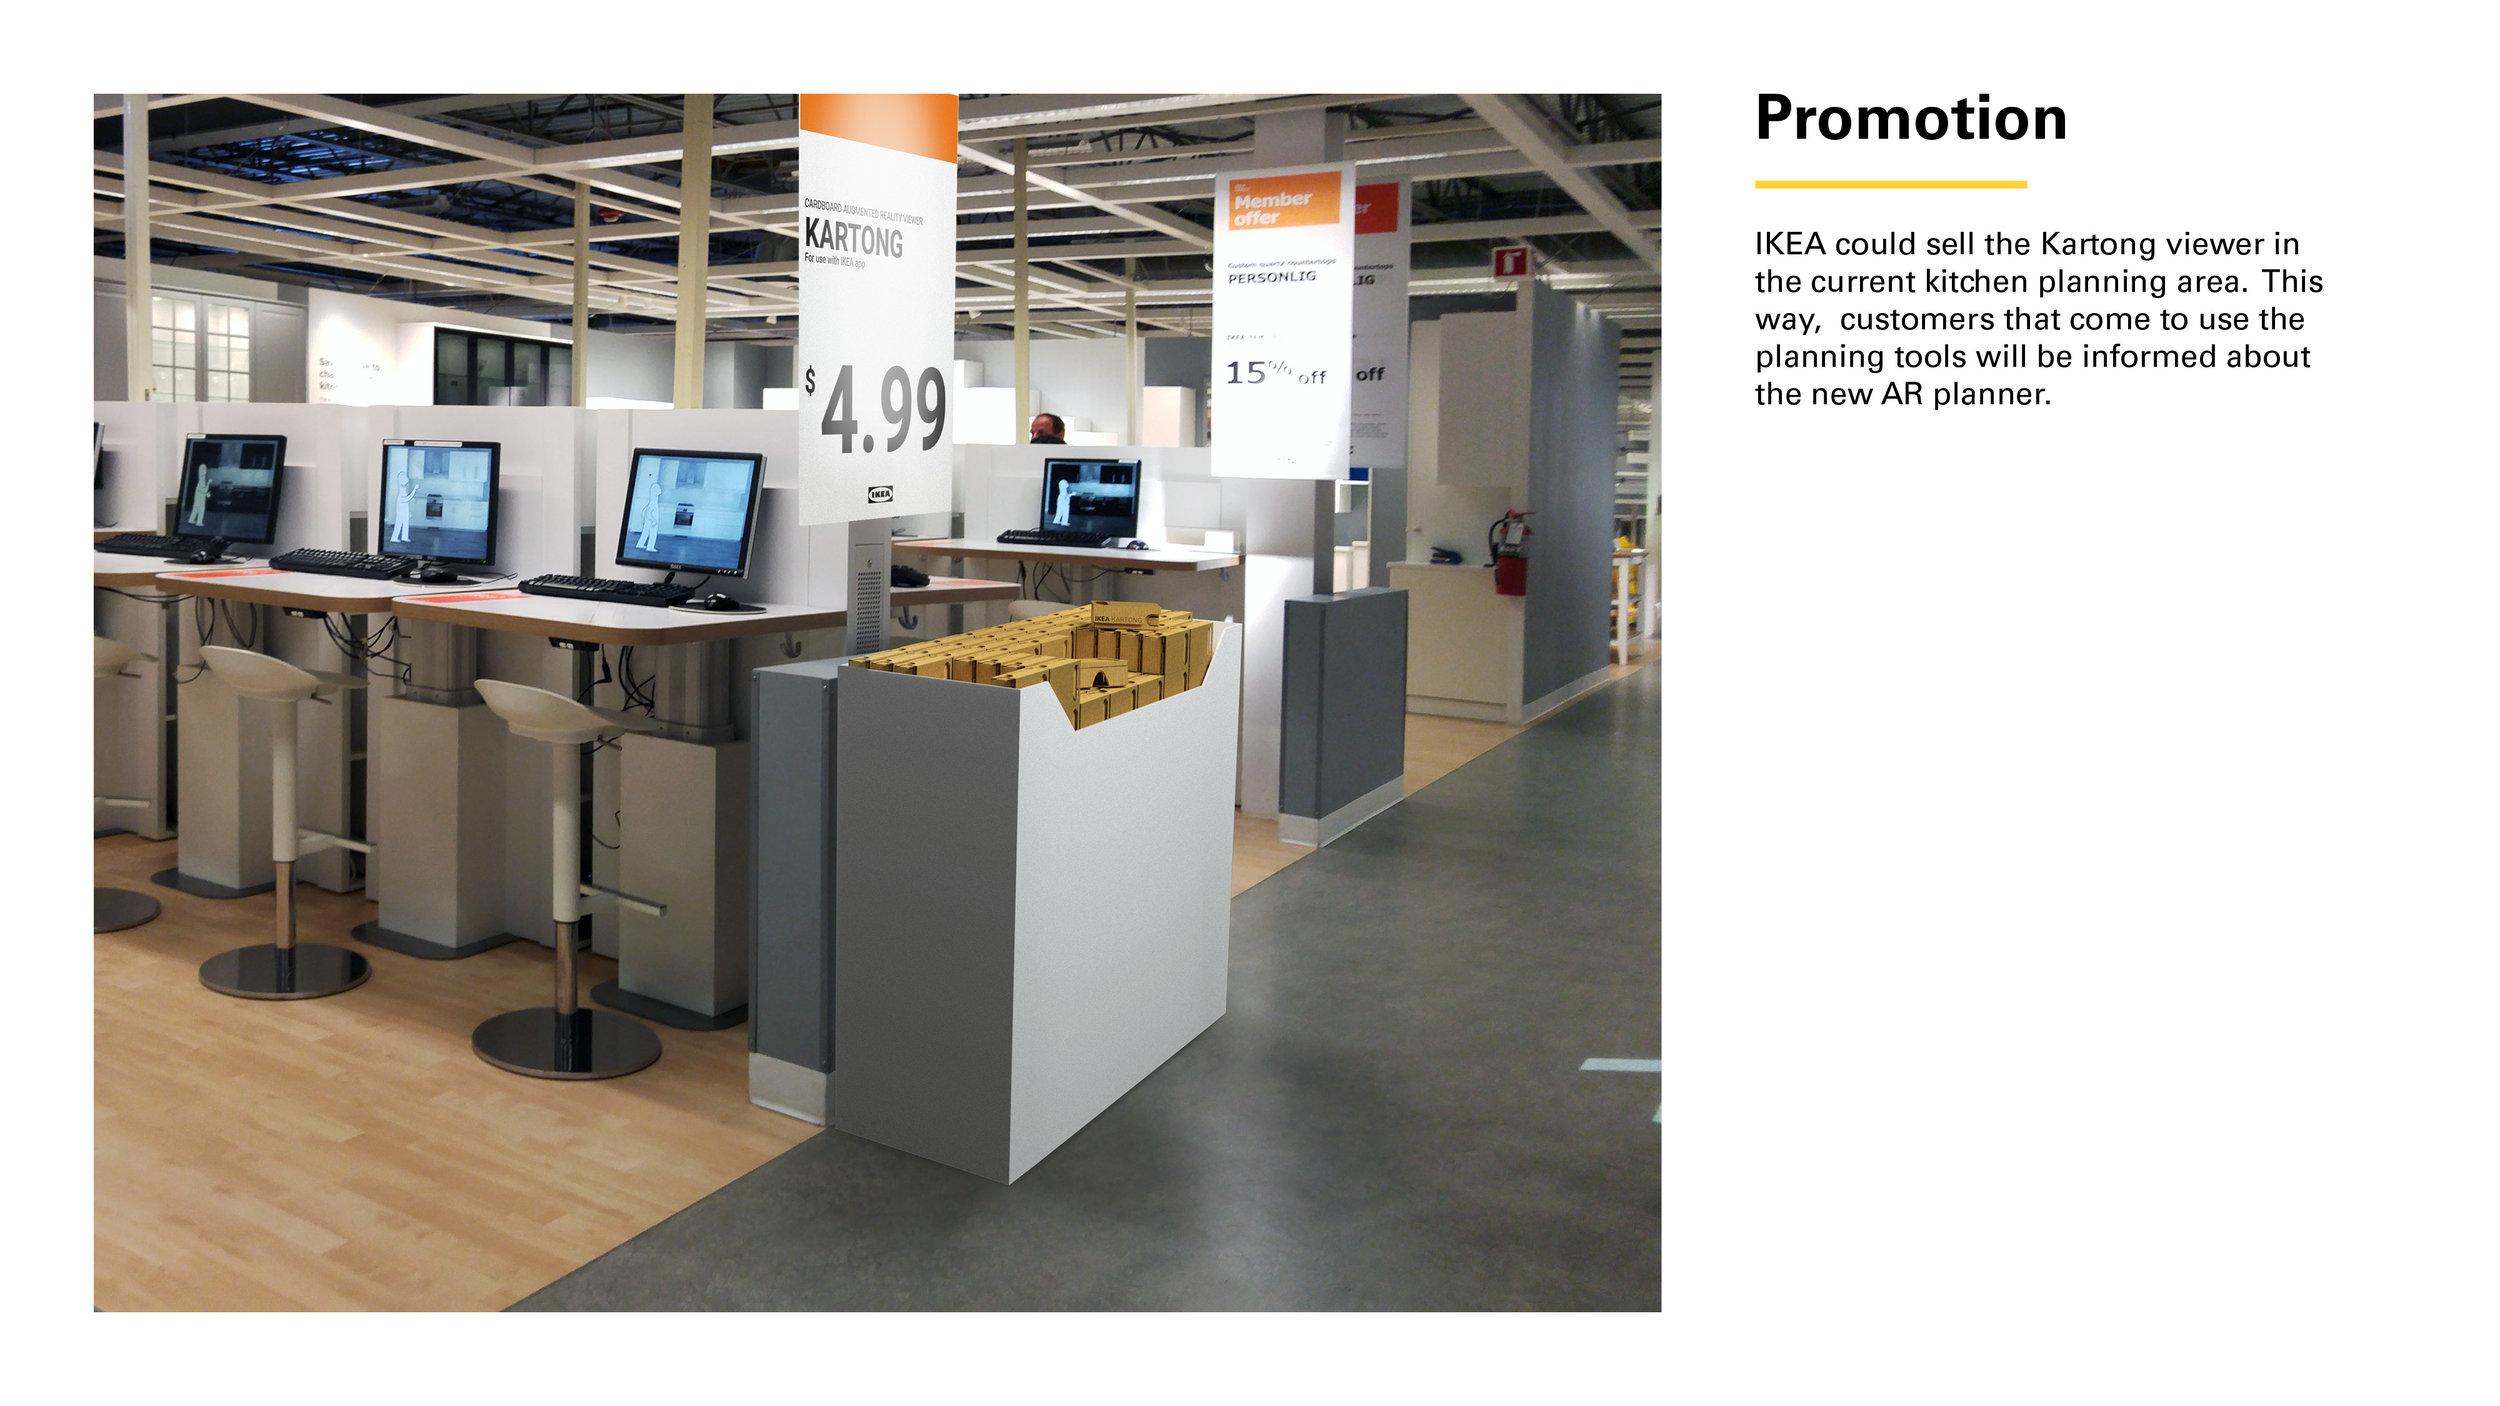 IKEA_AR_Planner_ProcessBook34.jpg